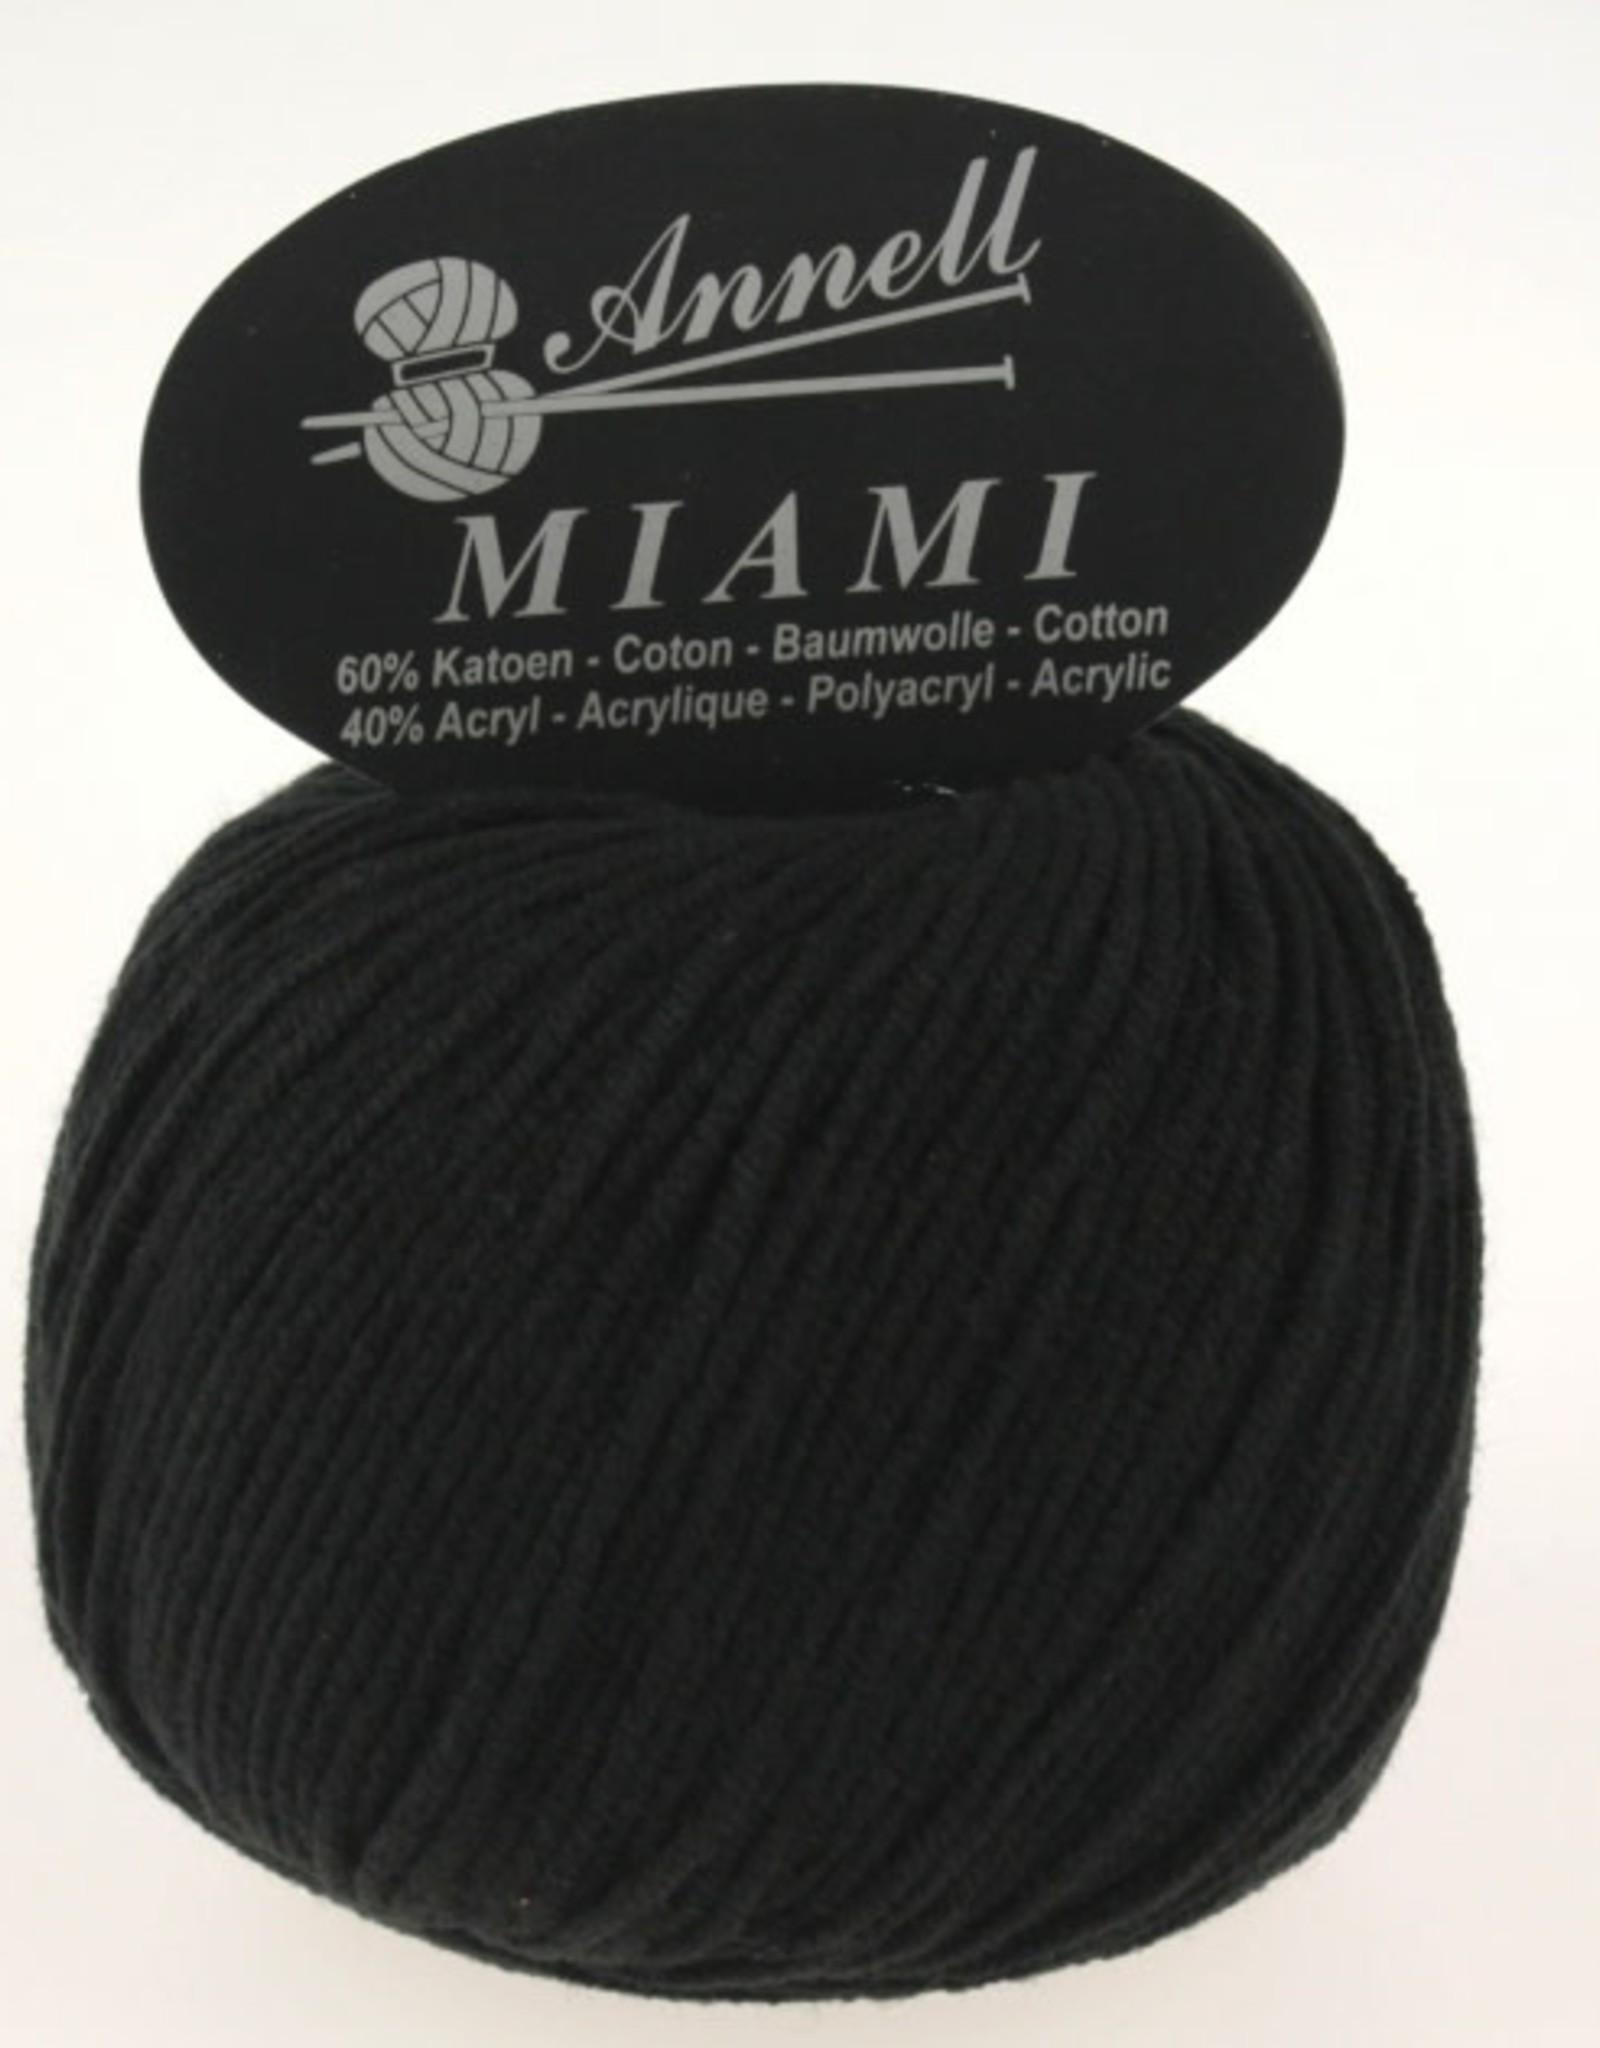 Annell Annell Miami 8959